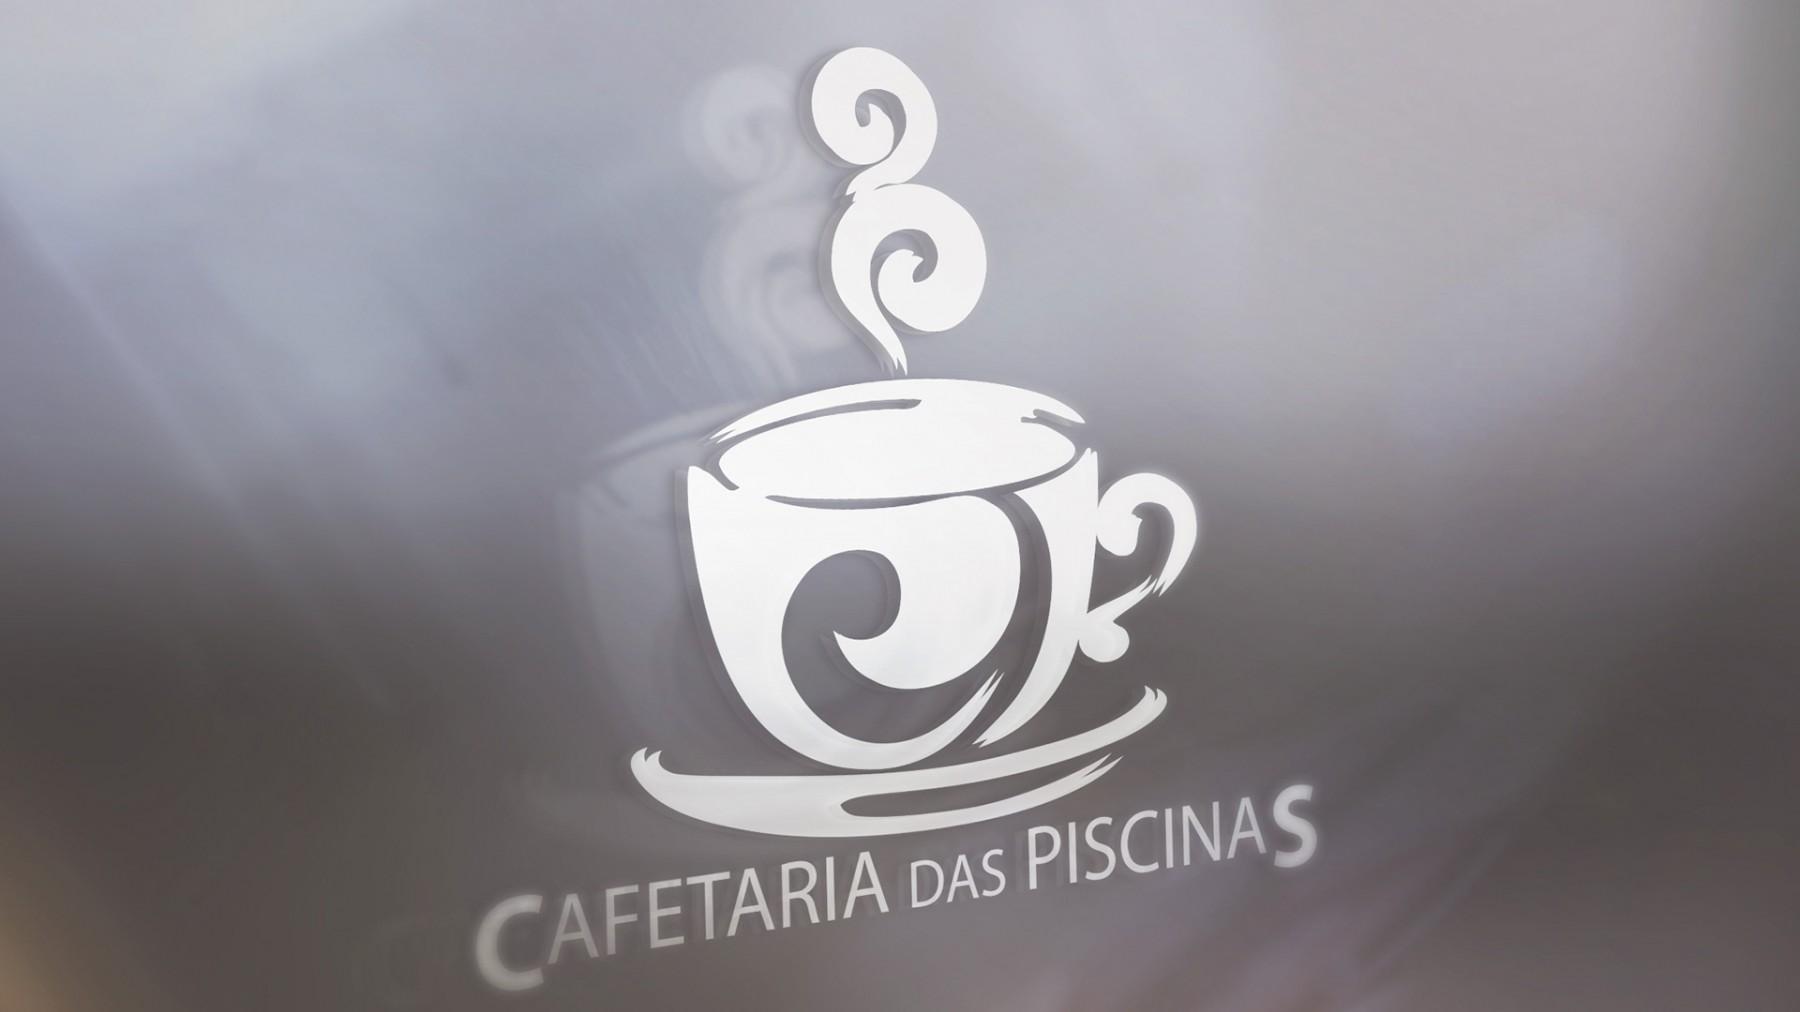 Cafetaria Piscinas | Identidade